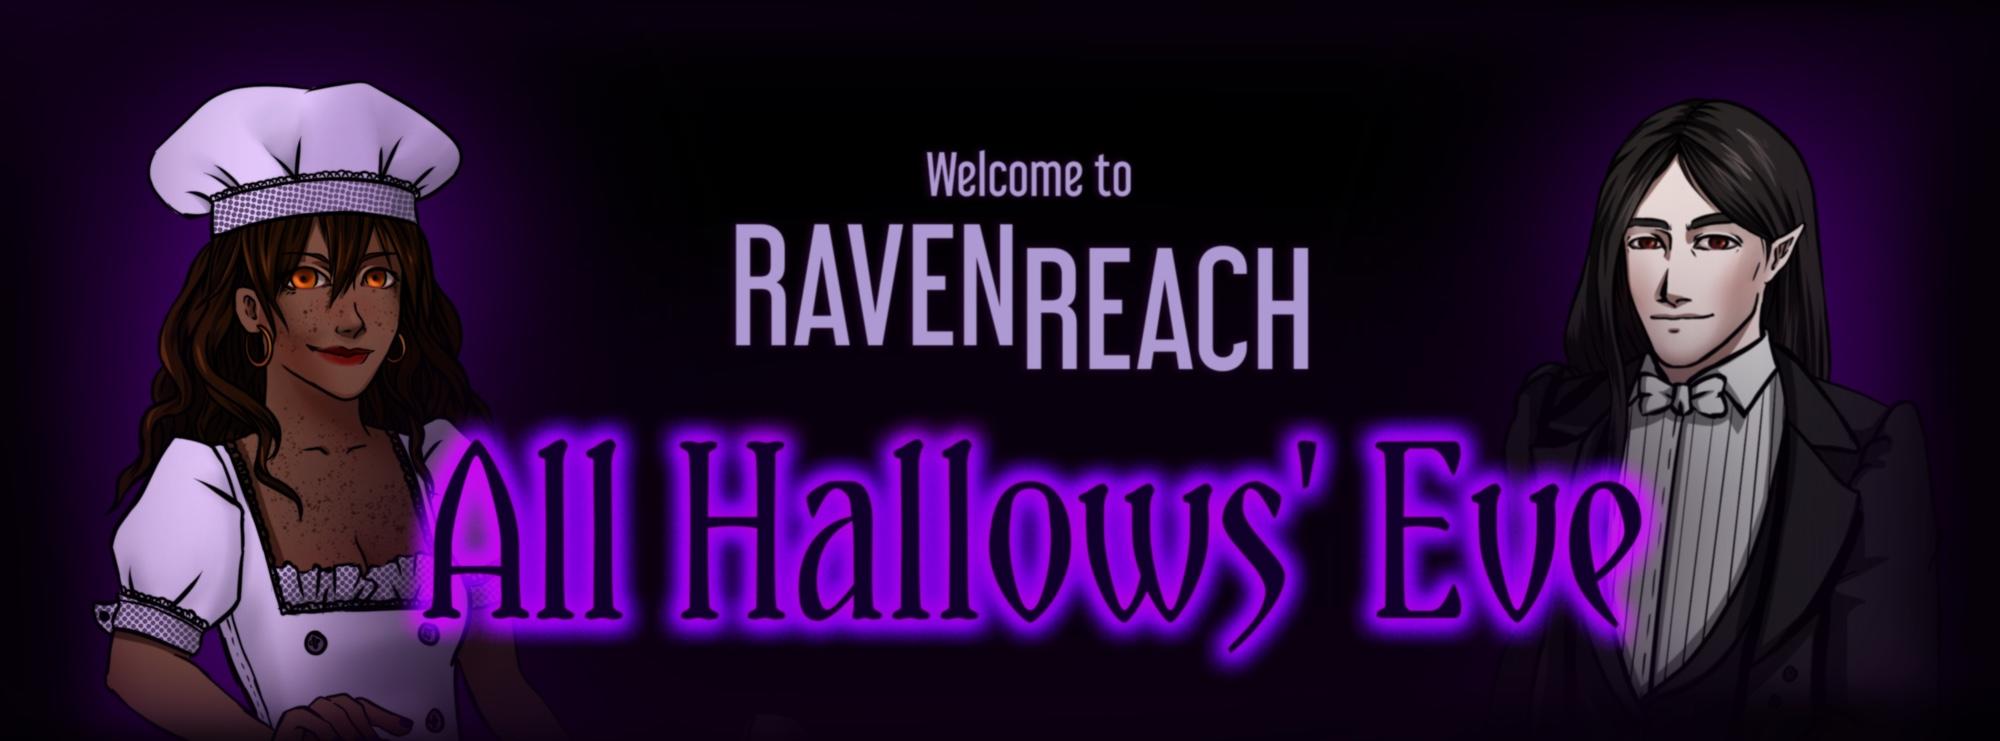 Raven Reach - All Hallows' Eve!